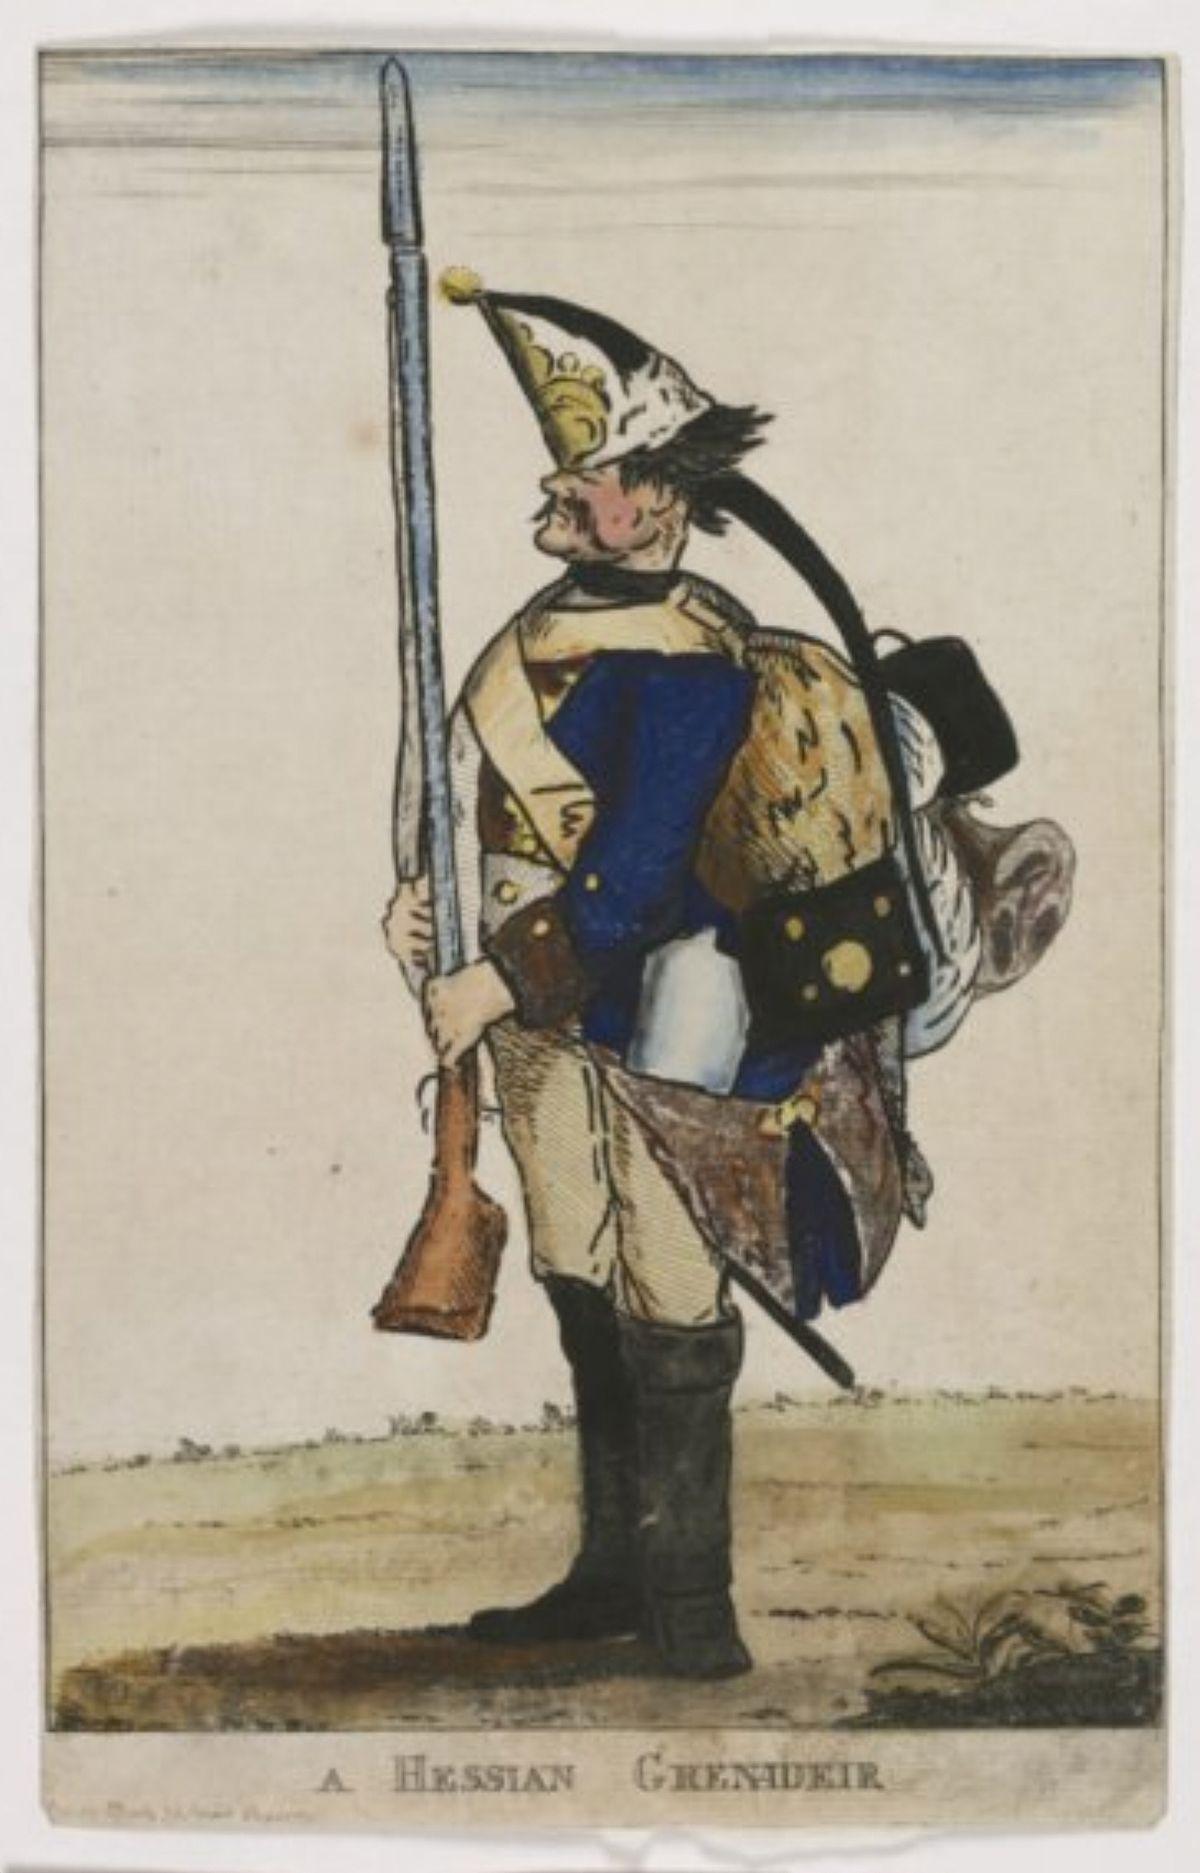 Soldatenzopf - Wikipedia